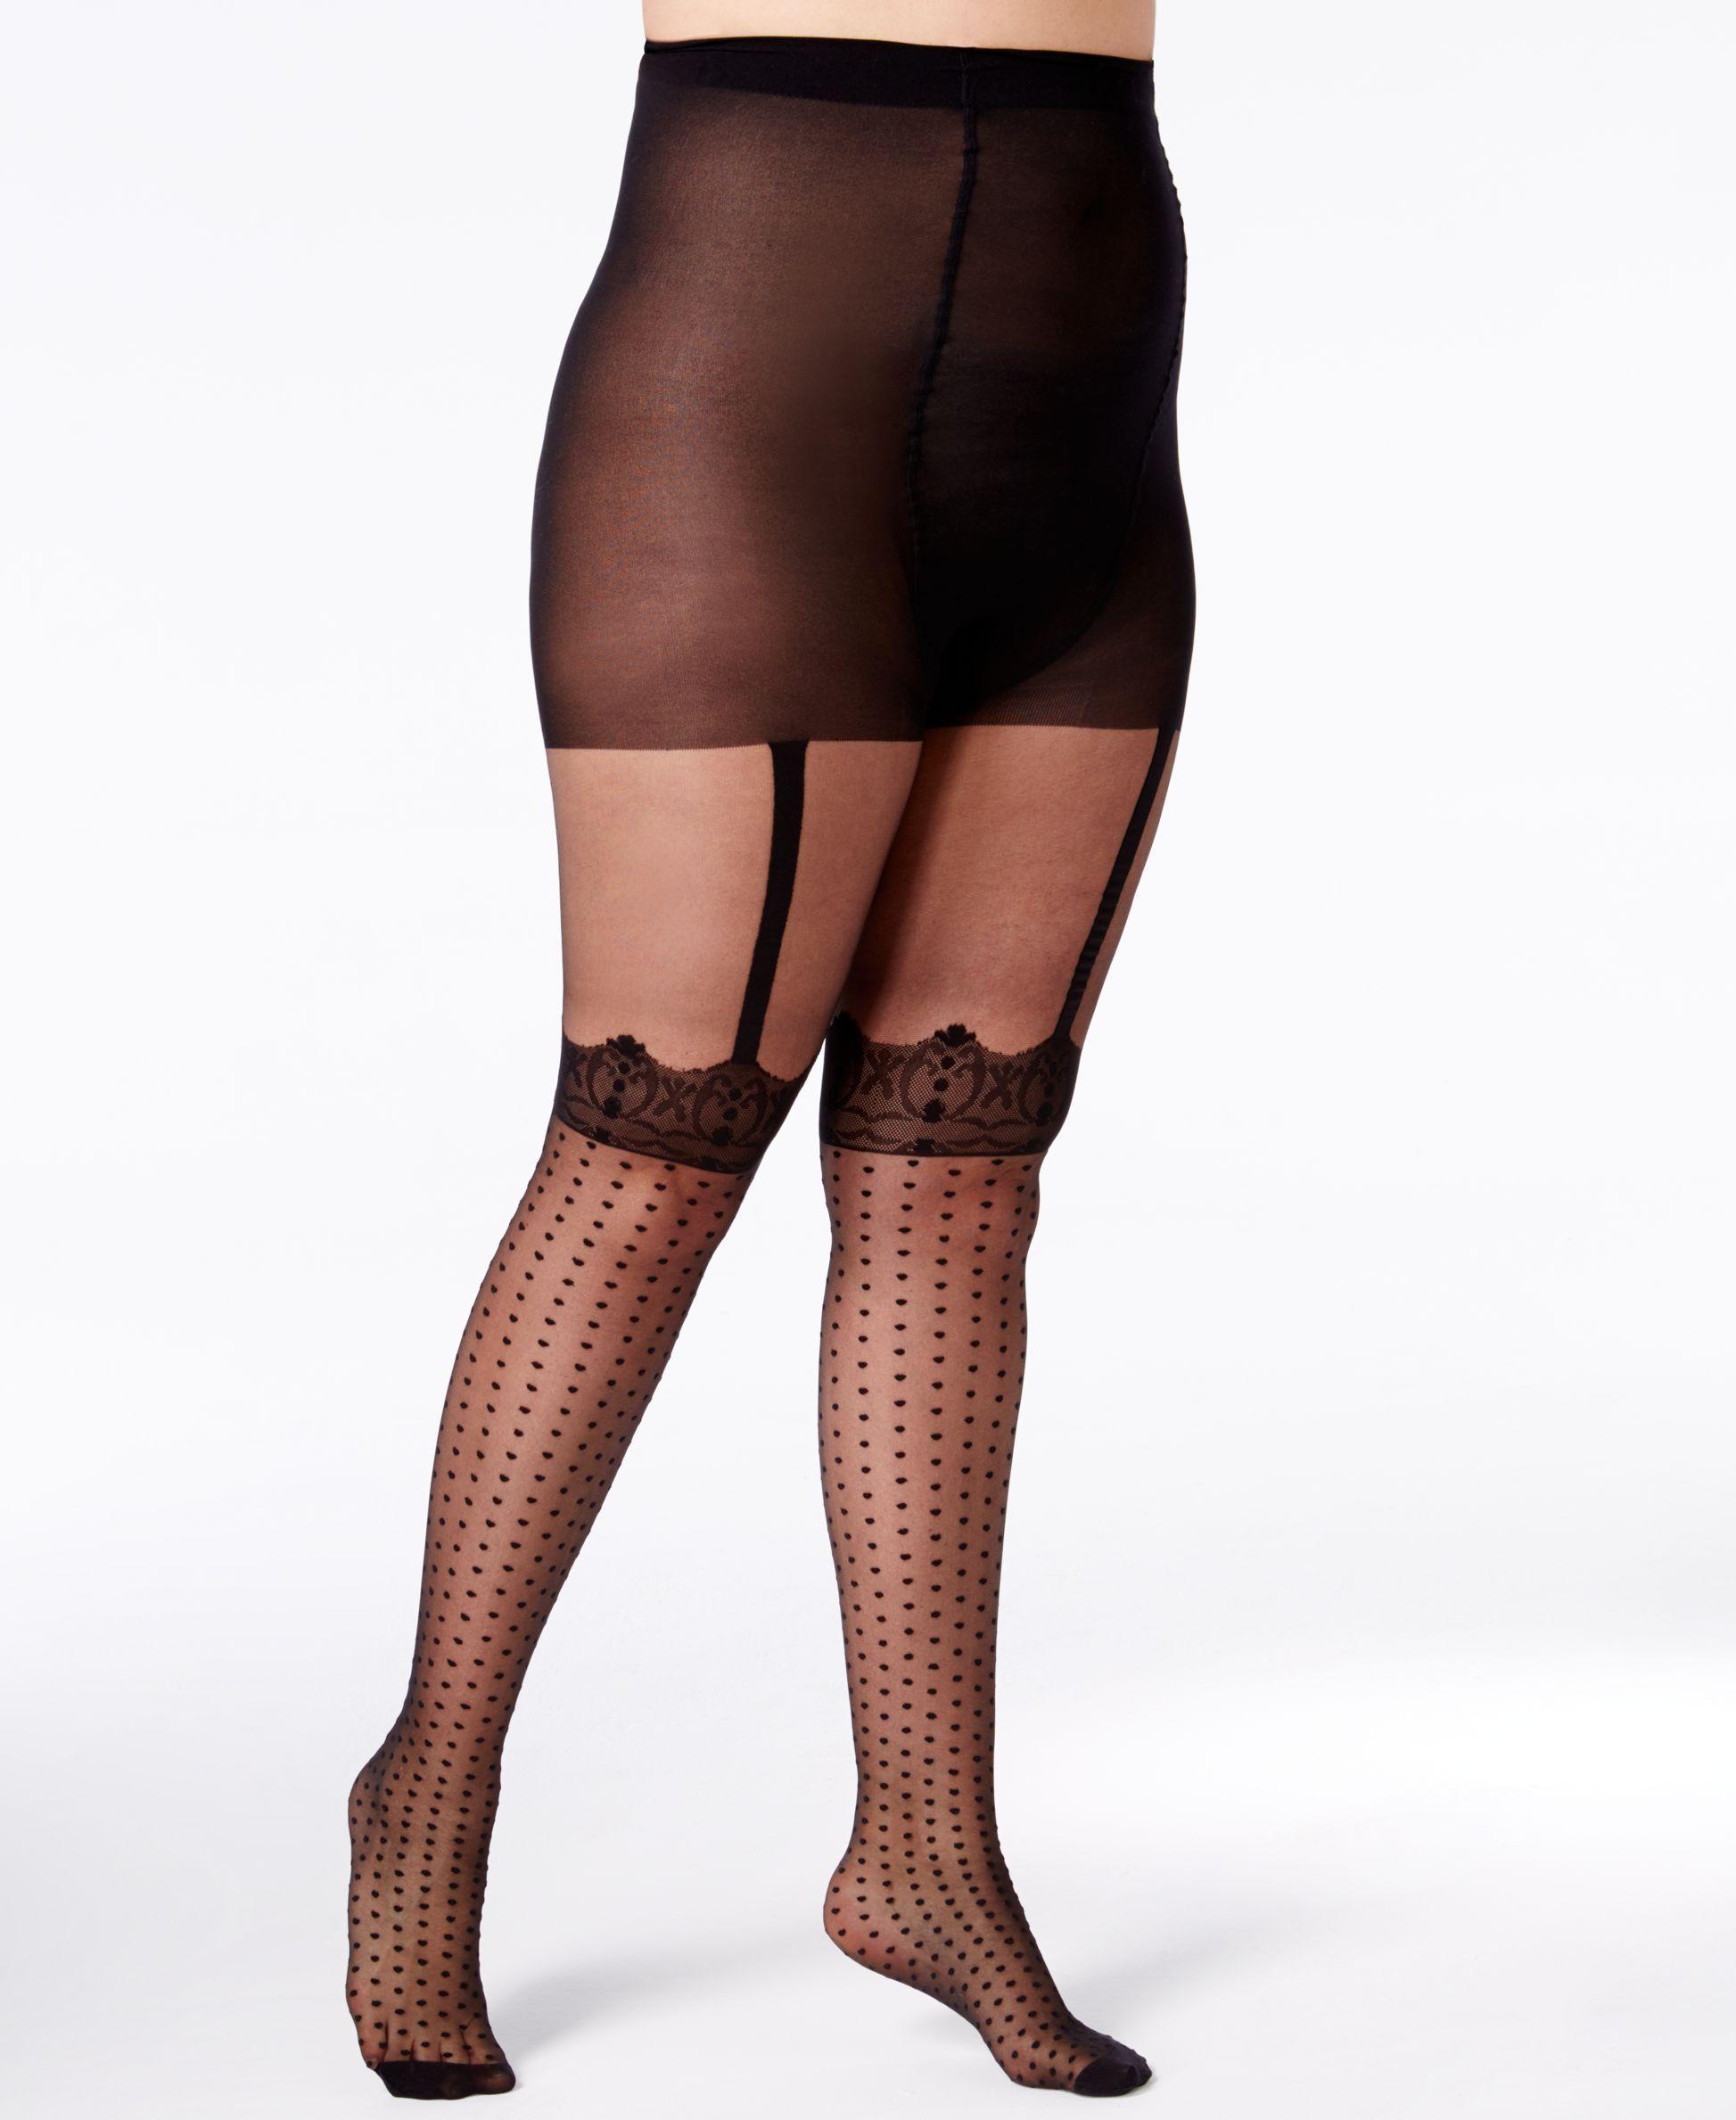 f4b30a82a51 Pretty Polly Plus Size Spotty Mock Suspender Tights